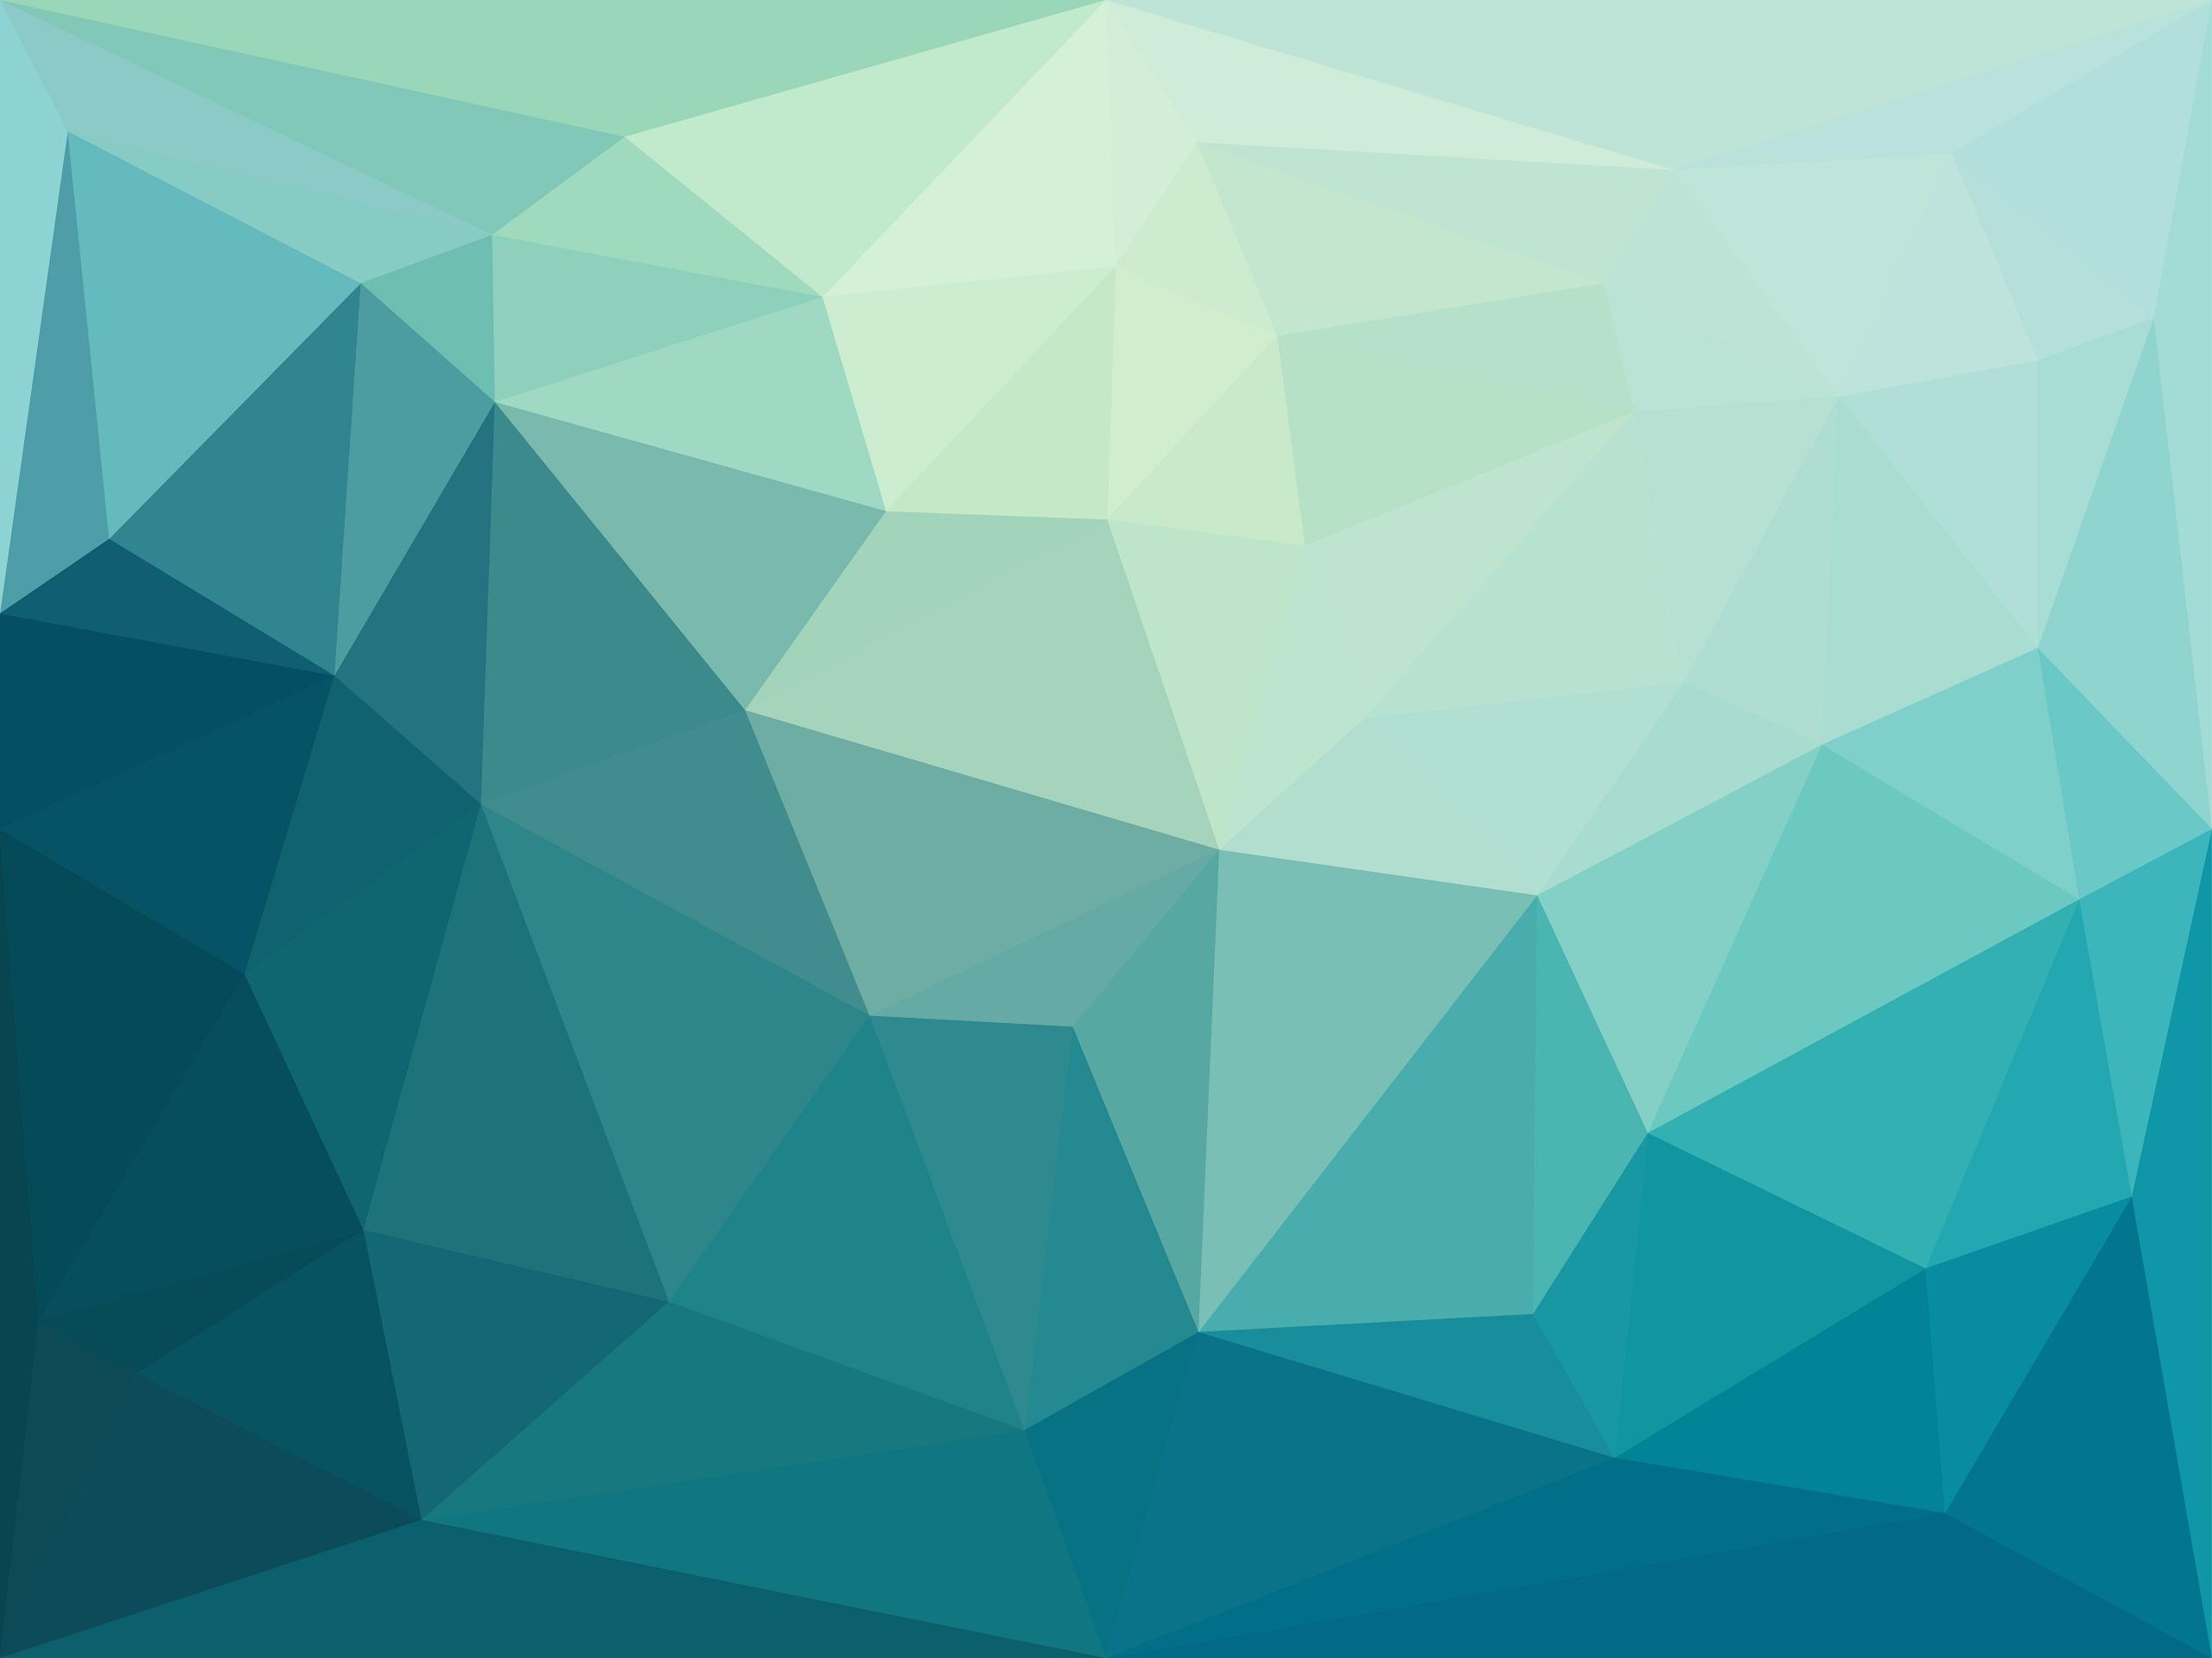 to wallpaper triangles design - photo #12